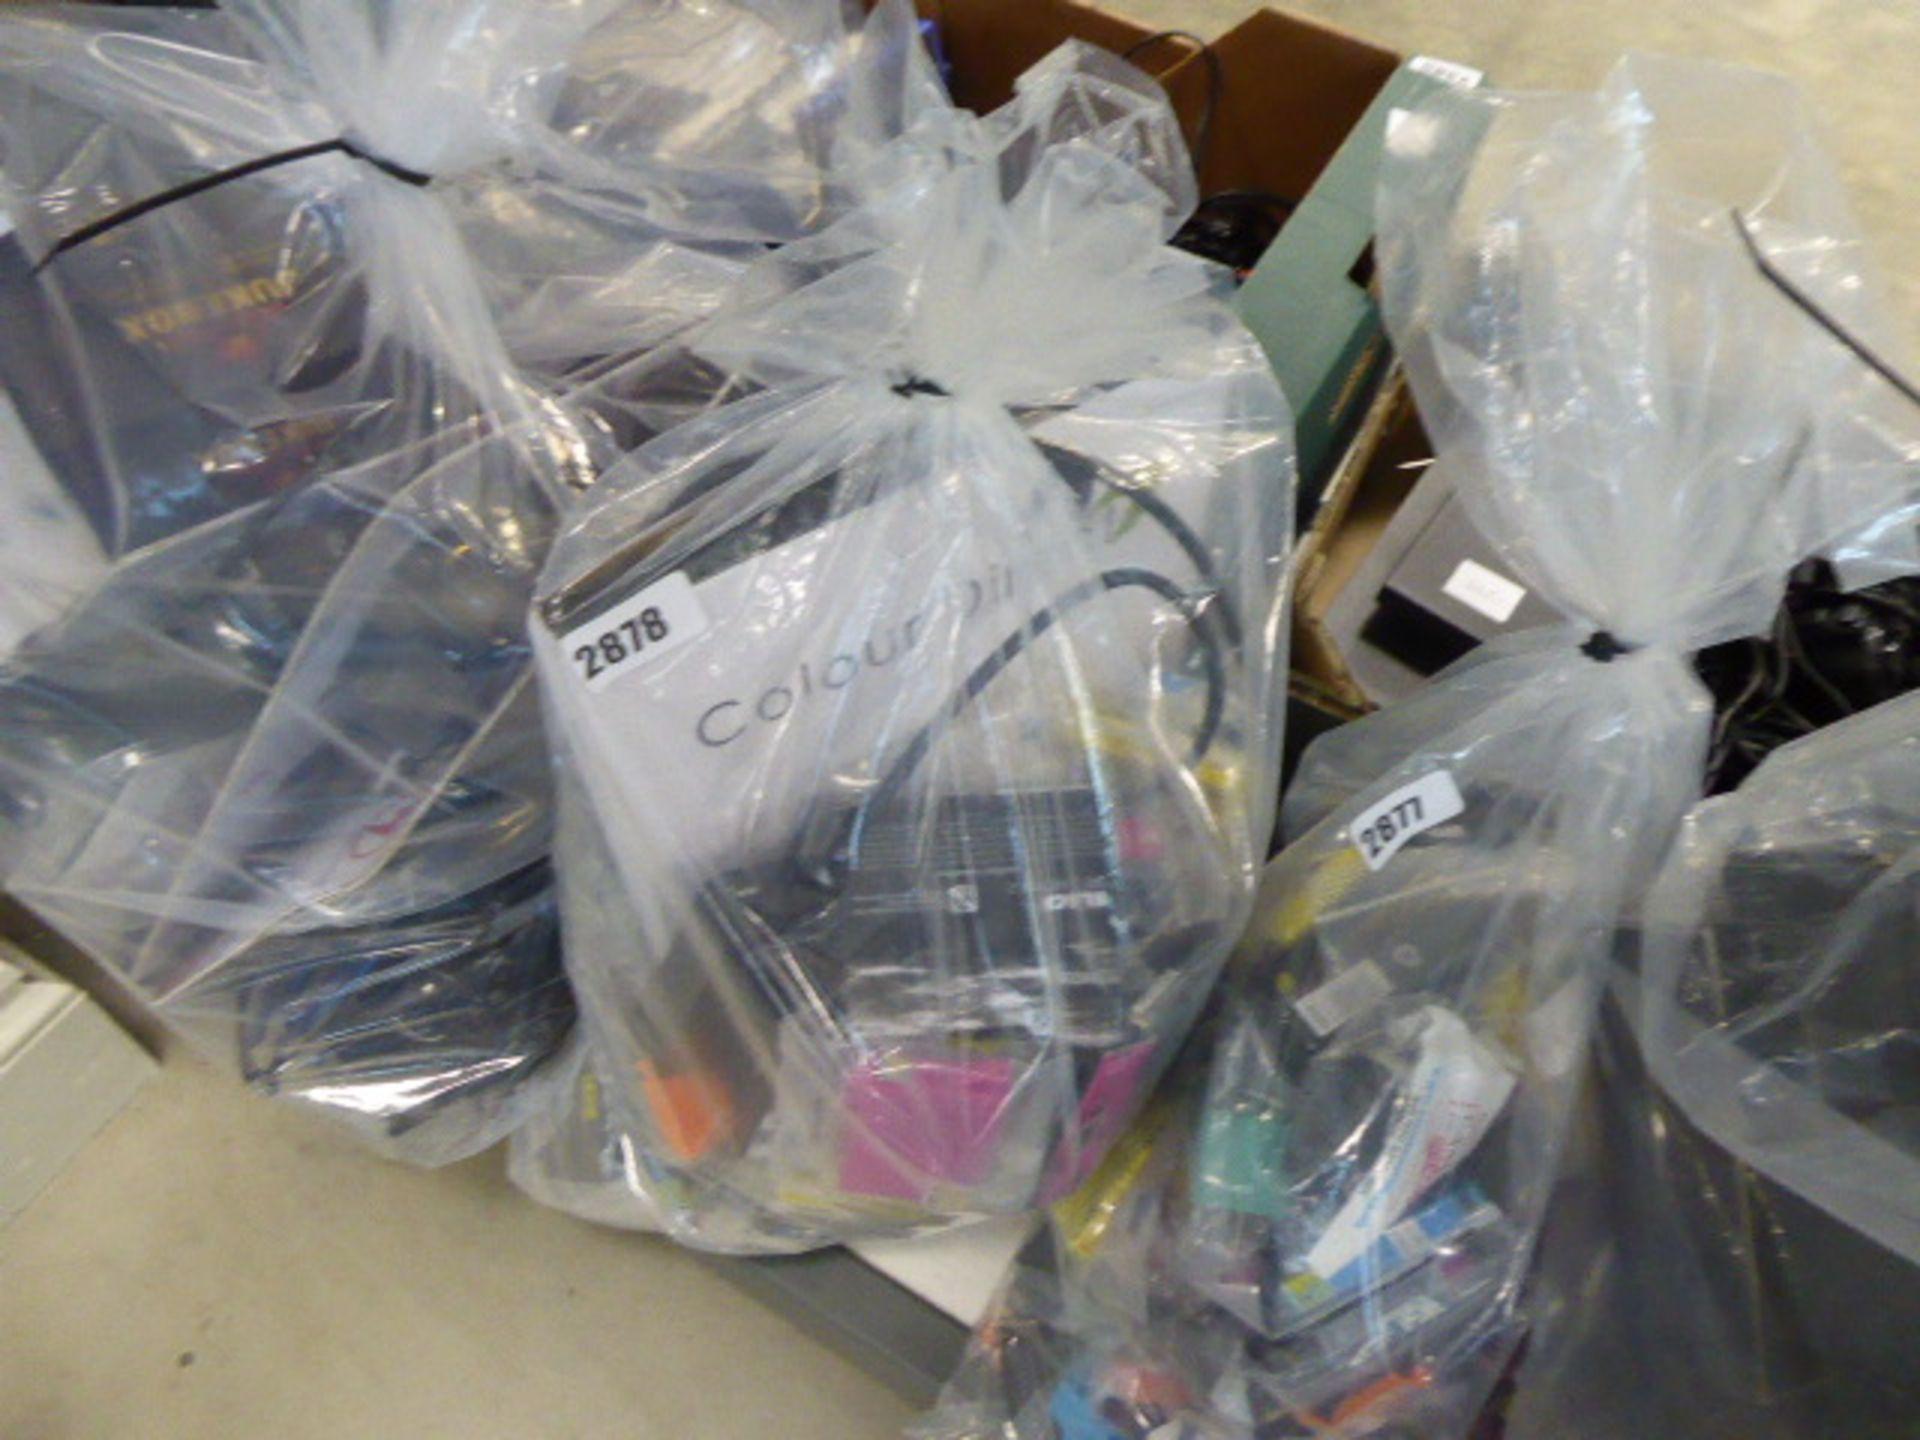 Lotto 2878 - Bag of mixed printer ink cartridges